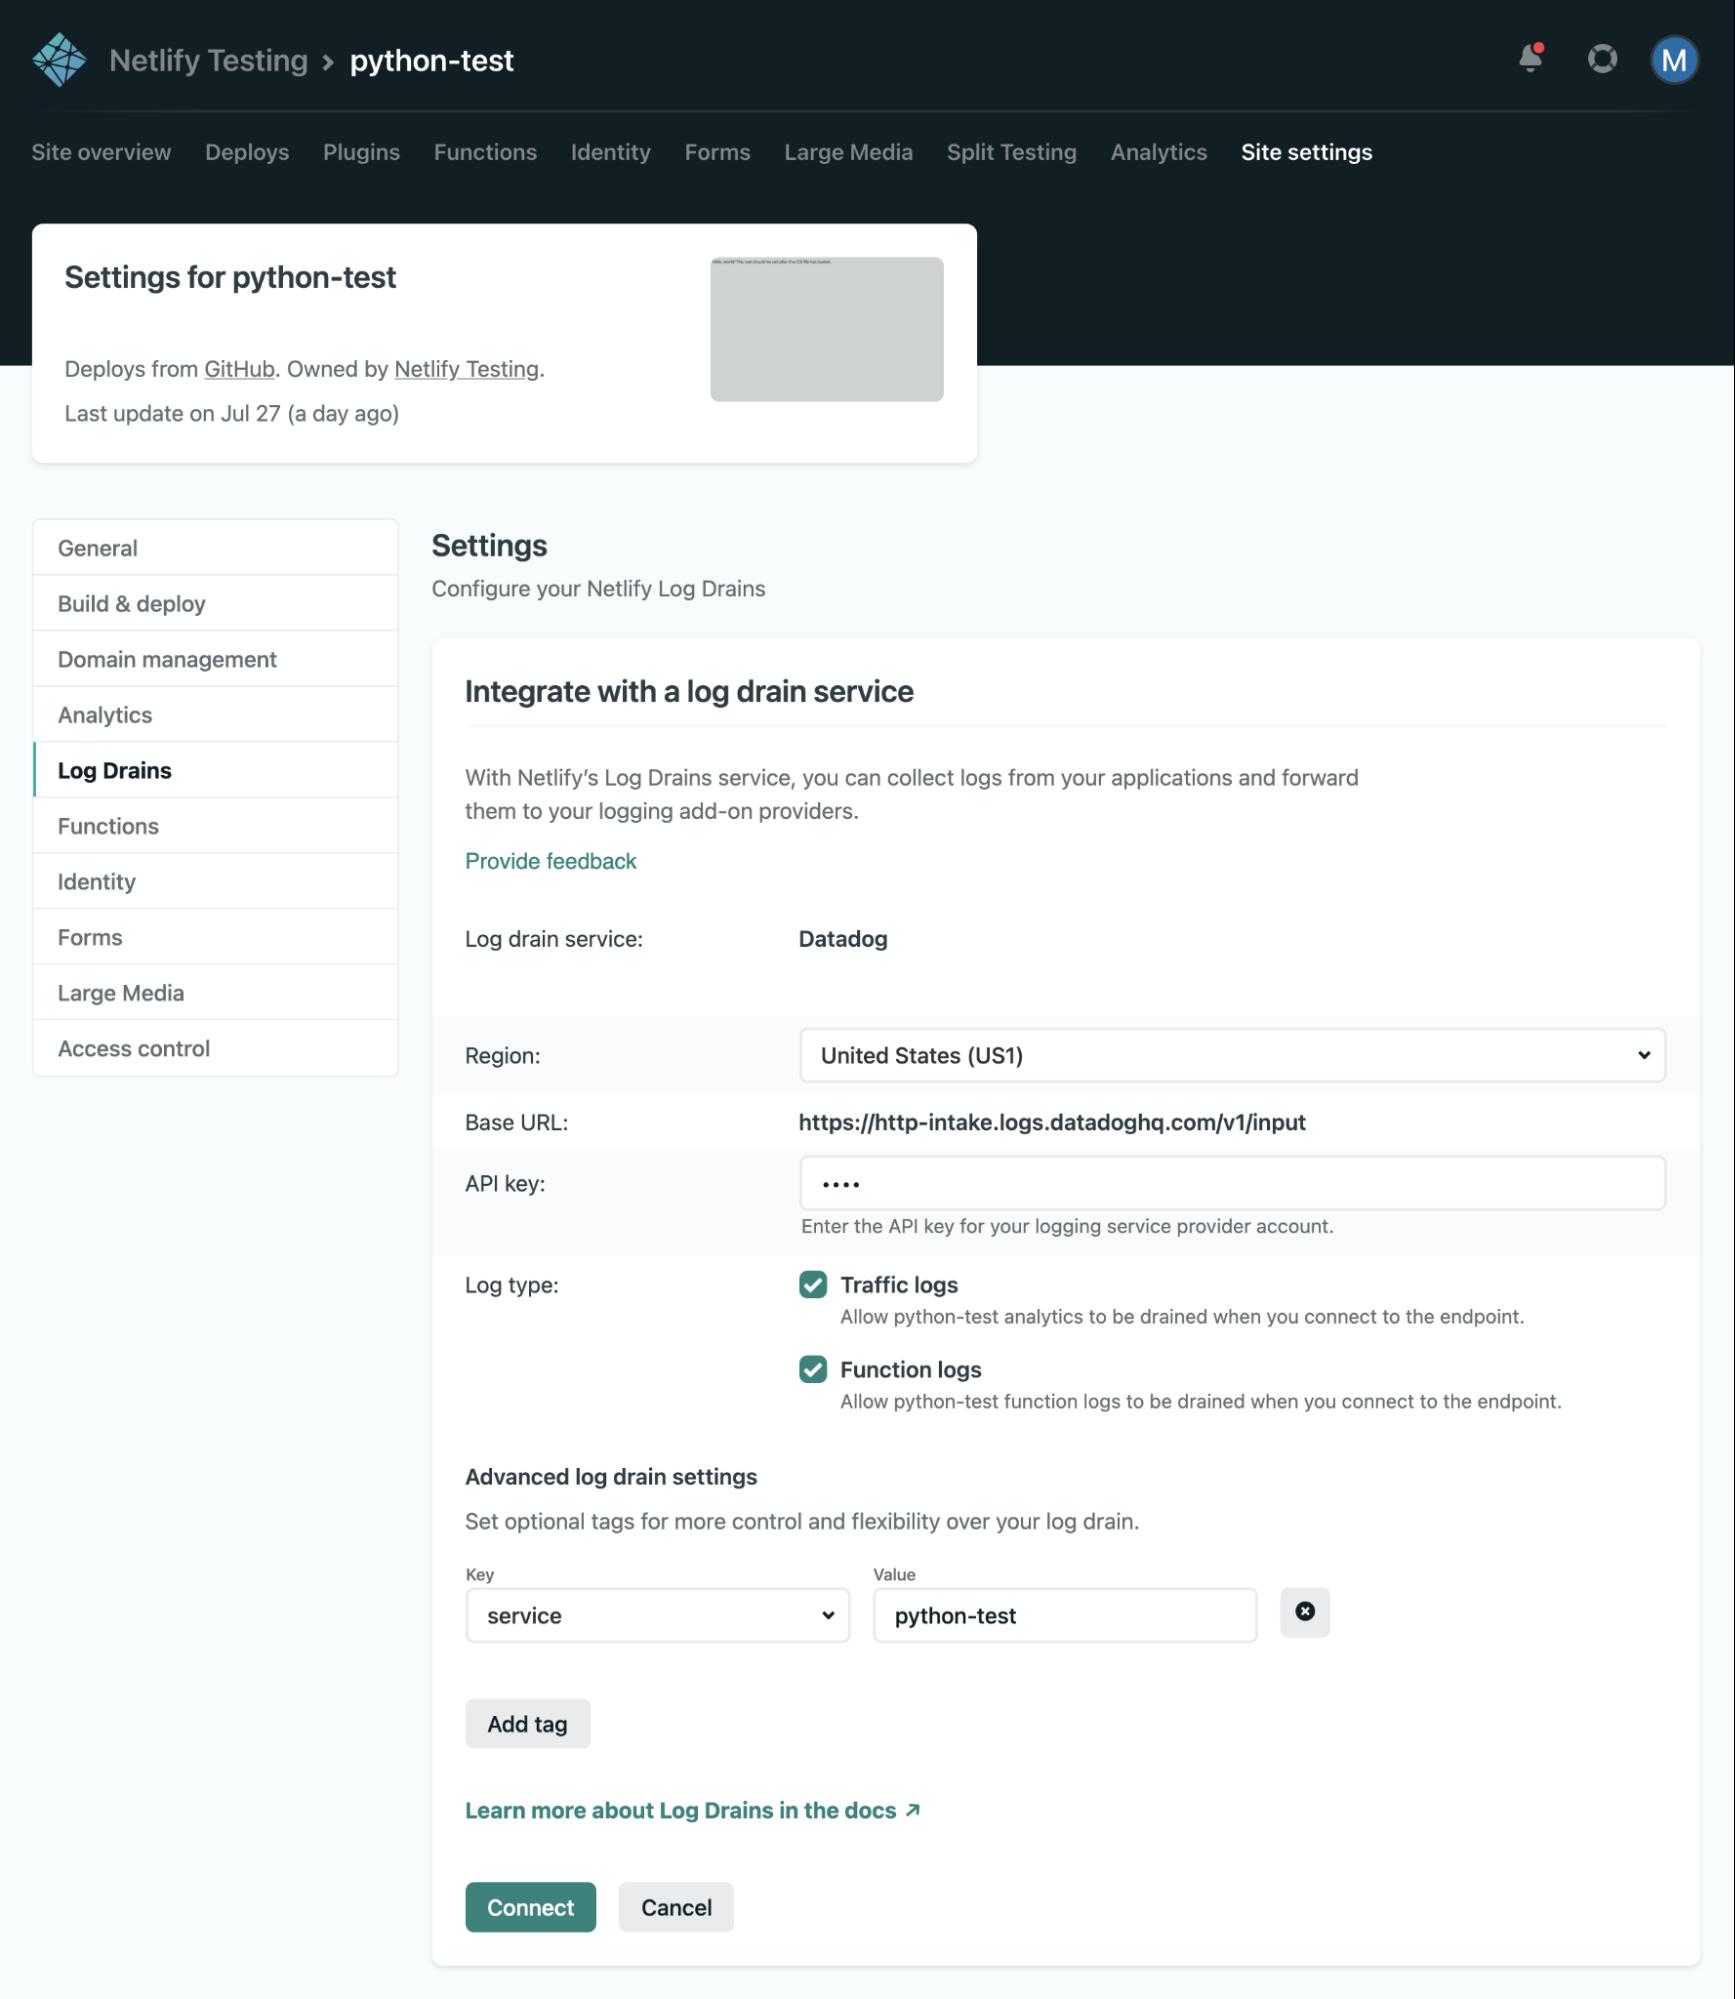 Datadog Netlify log drain UI image